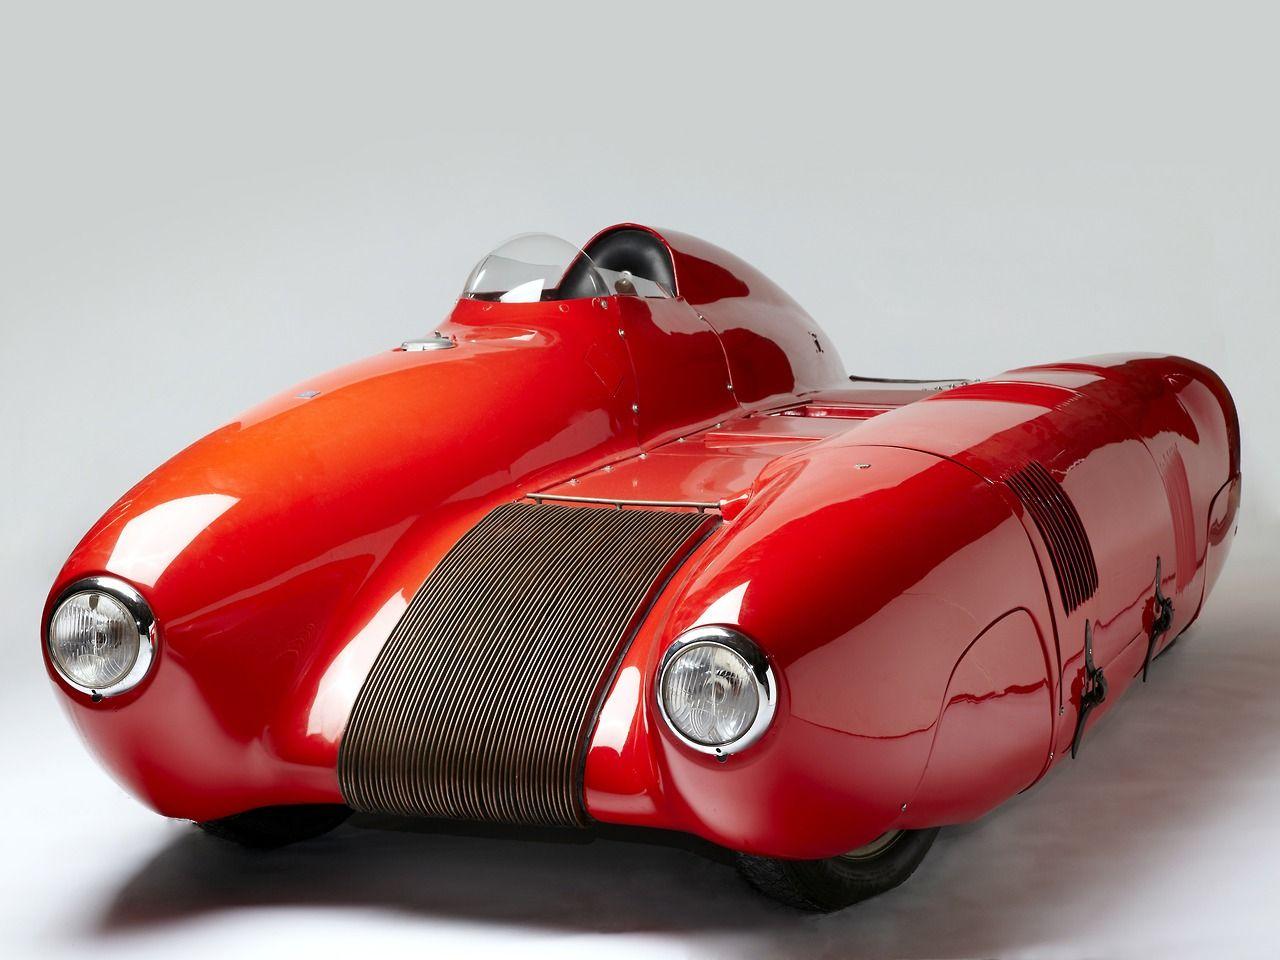 Rocketumblr | Nardi-Giannini 750 Bisiluro | Maschinen Krieger & Machines of Future Past | Cars ...